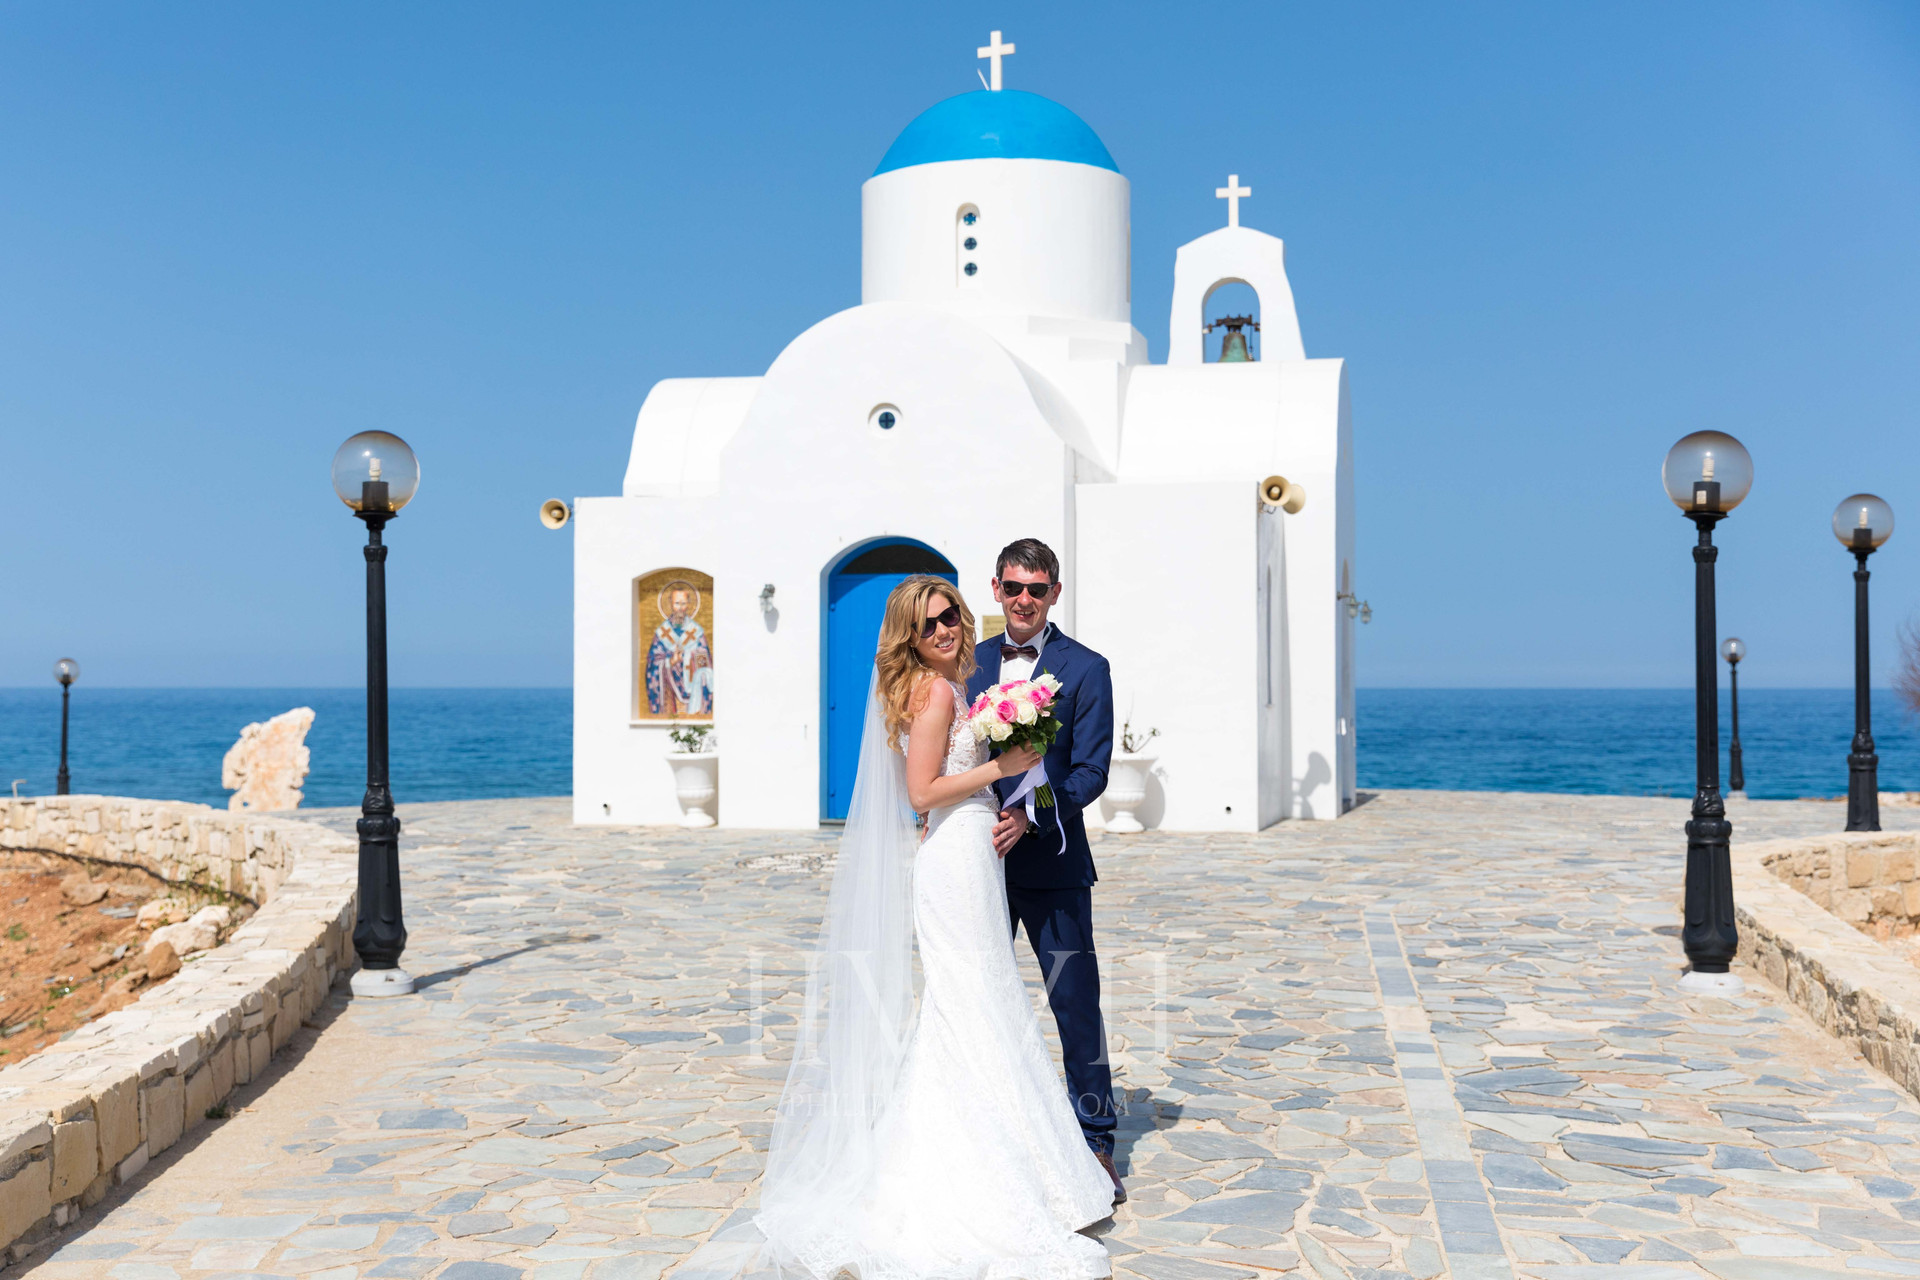 Gintare and Albertui Wedding-32.jpg